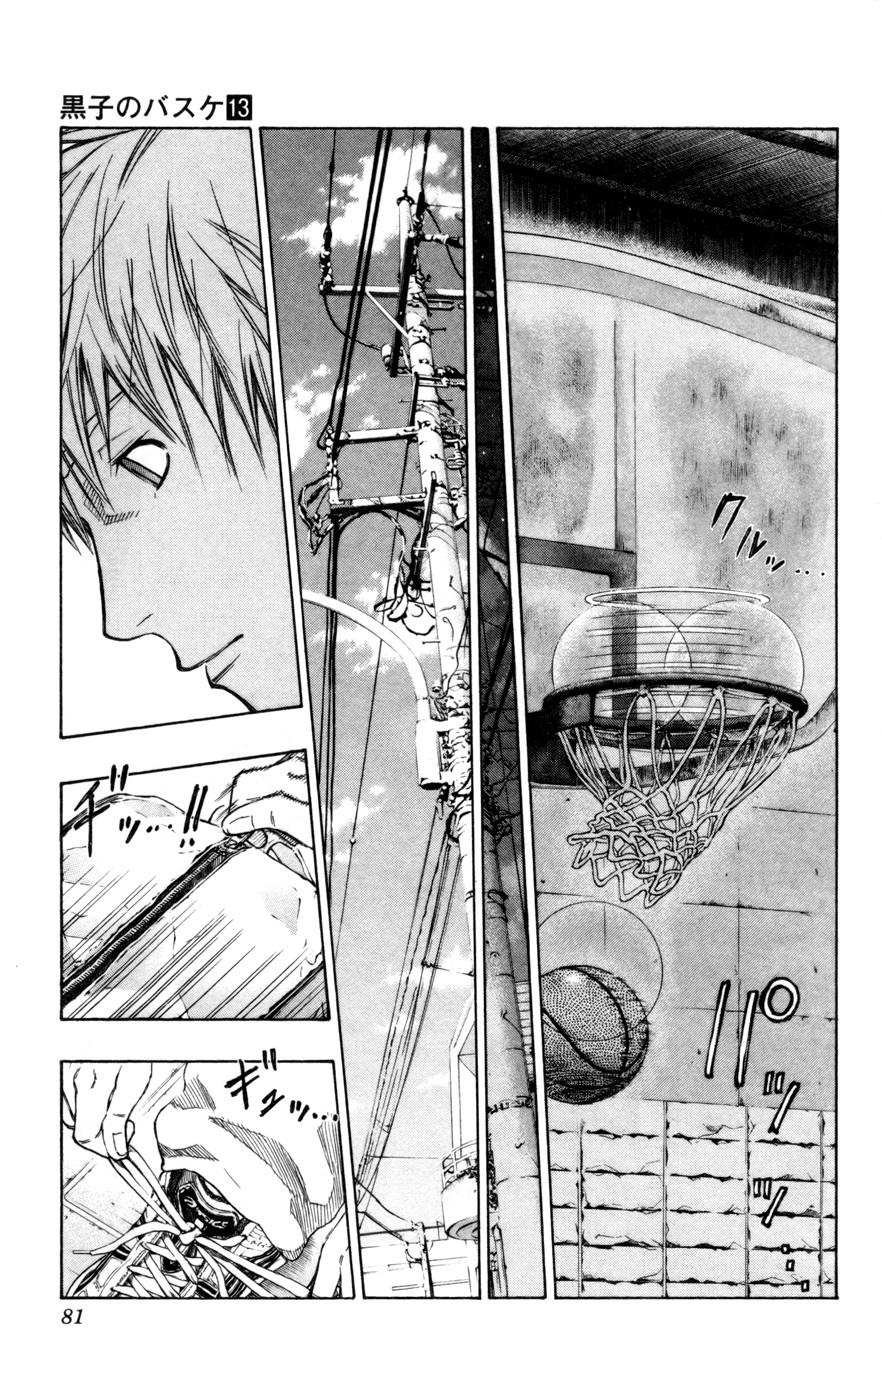 Kuroko no Basket Manga Chapter 112 - Image 15